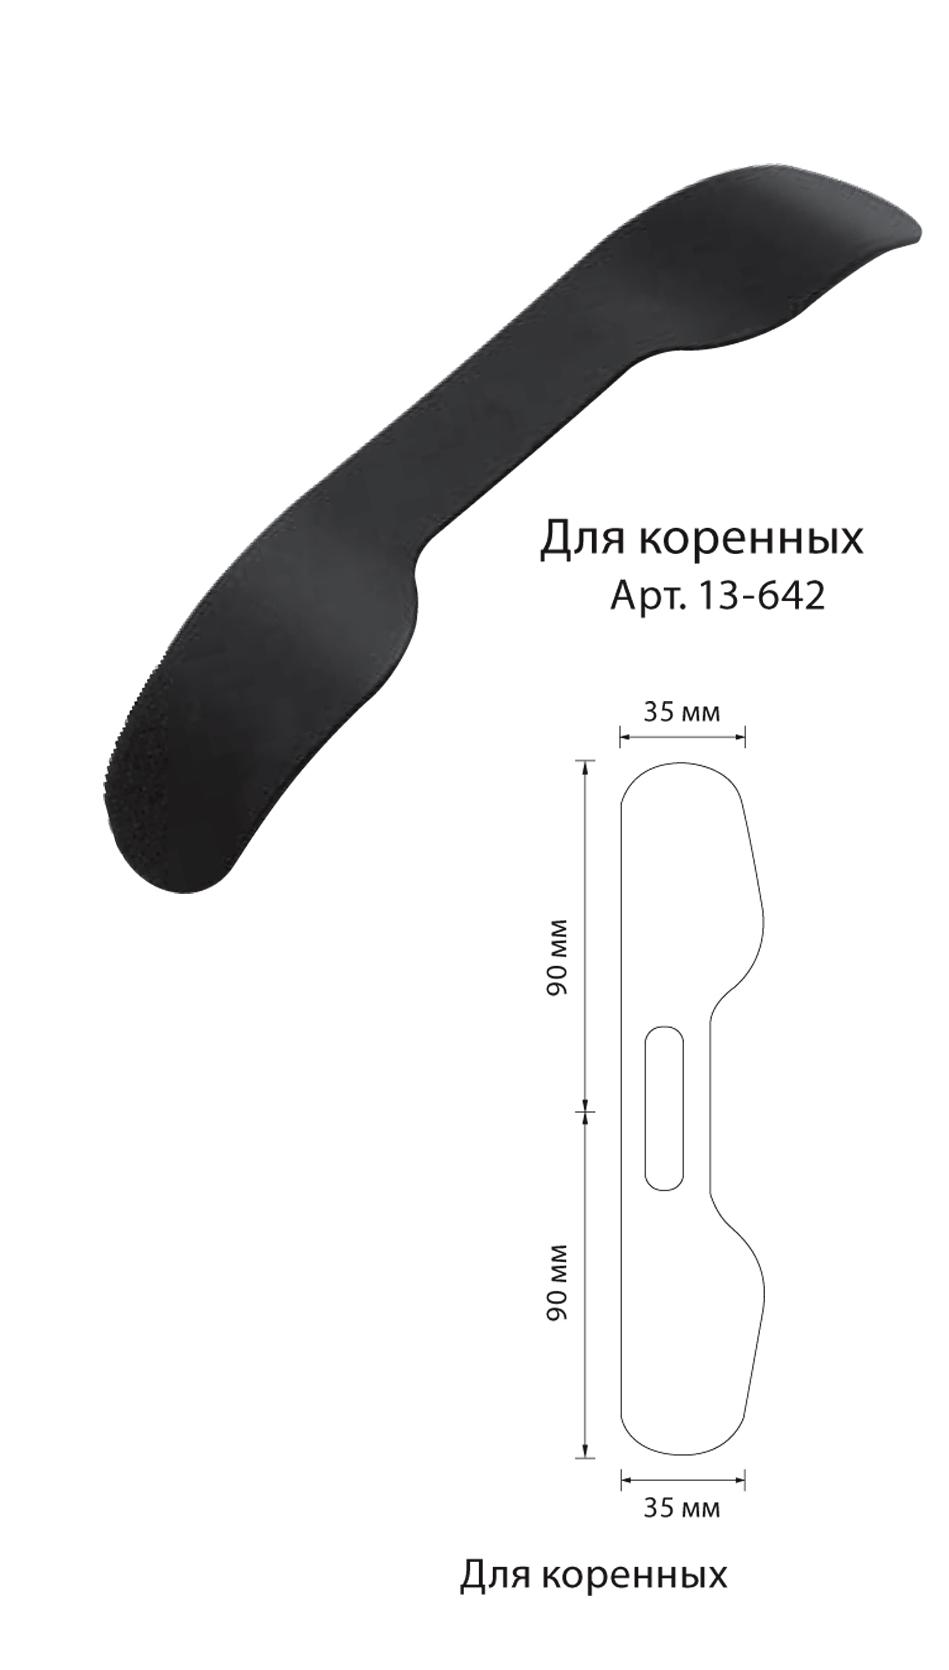 rotorasshiritel-retraktor-shechniy